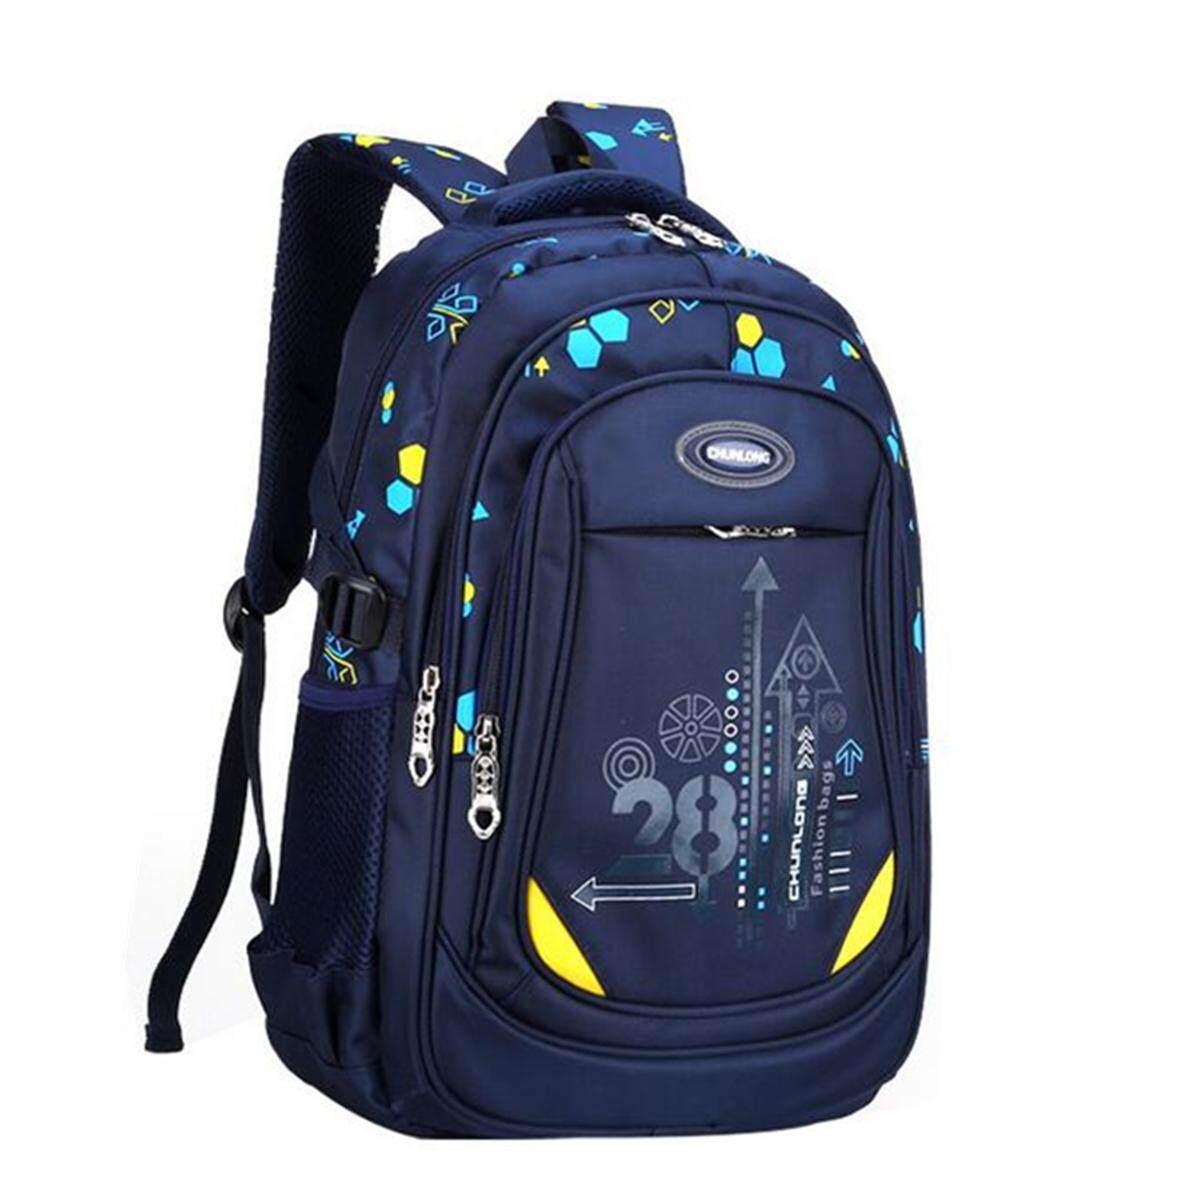 c2094d5d02 Kids Nylon Large Backpack Children School Bag for Middle Primary School  Student  Dark Blue